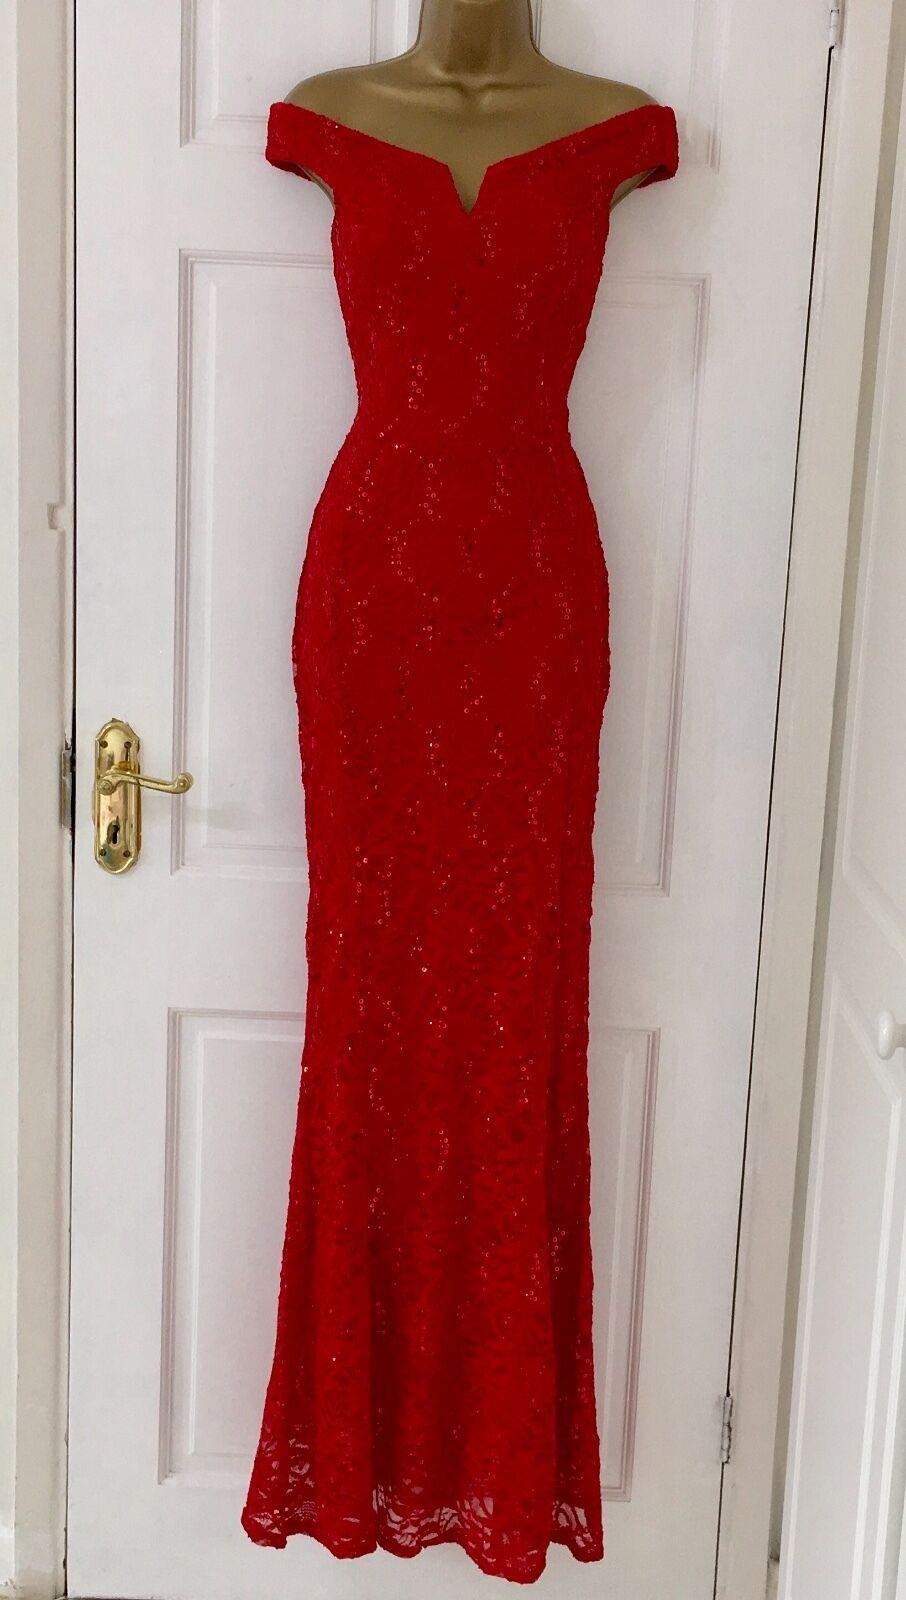 17 Kreativ Ebay Abend Kleid StylishAbend Wunderbar Ebay Abend Kleid Galerie